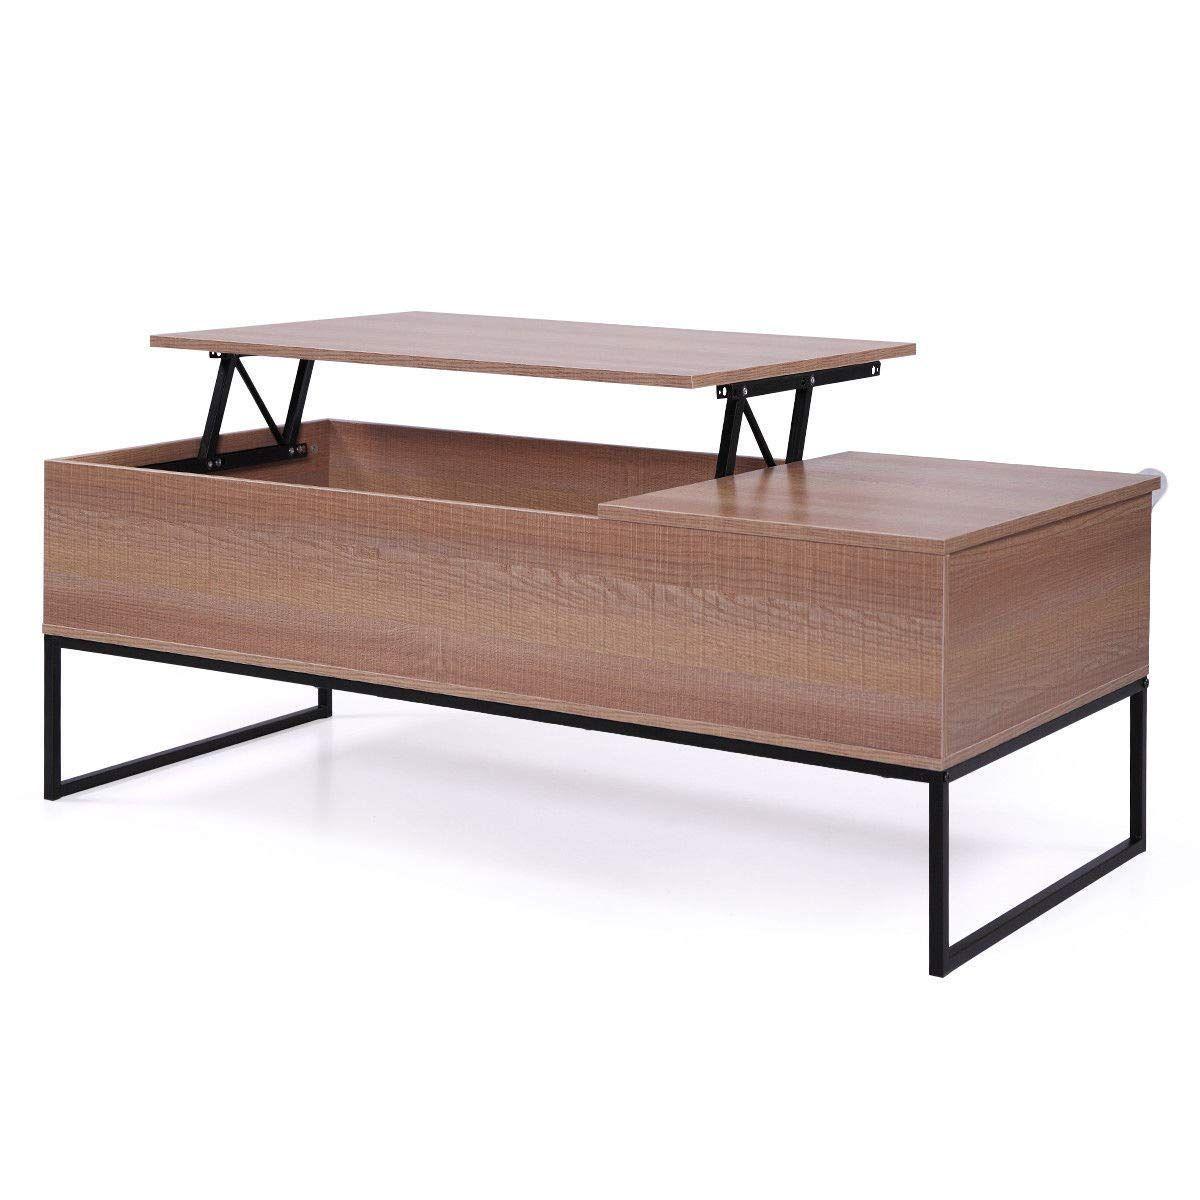 Fdinspiration Minimalist Design Mdf Board Coffee Table Lift Toptea Desk W Storage Drawer Ebook You Could Figure Out Ev Coffee Table Table Lift Coffee Table [ 1200 x 1200 Pixel ]